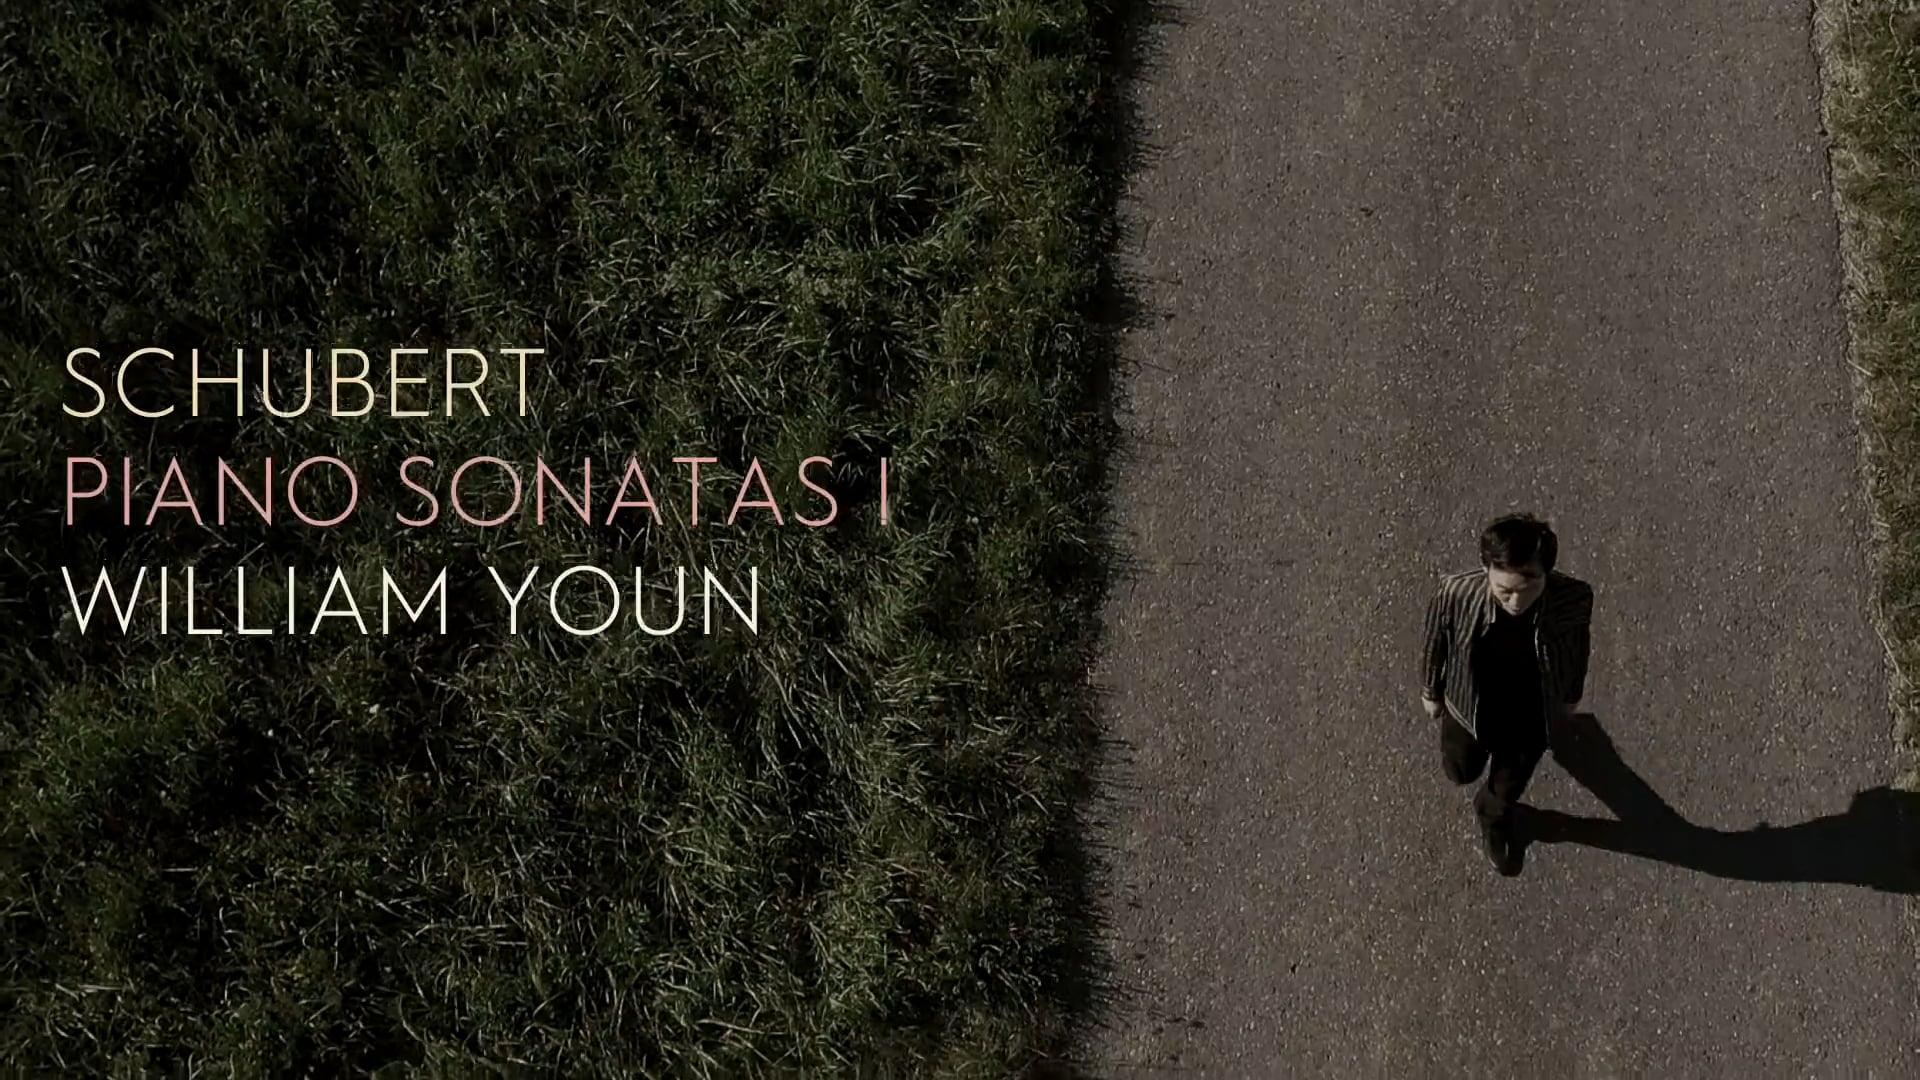 EPK Sony: Schubert Piano Sonatas I - William Youn